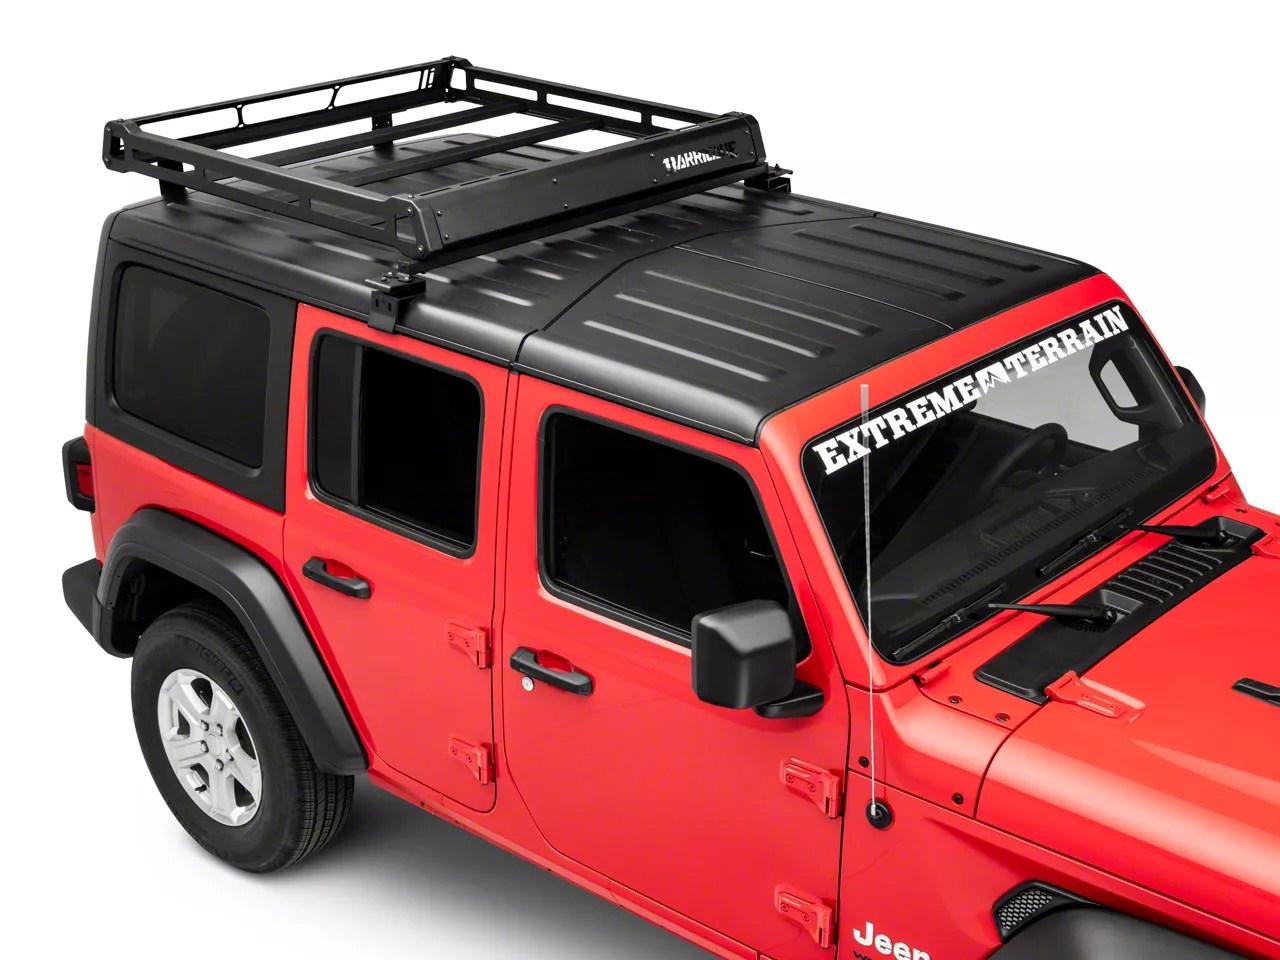 barricade removable hard top roof basket for oem hard top 18 21 jeep wrangler jl 4 door